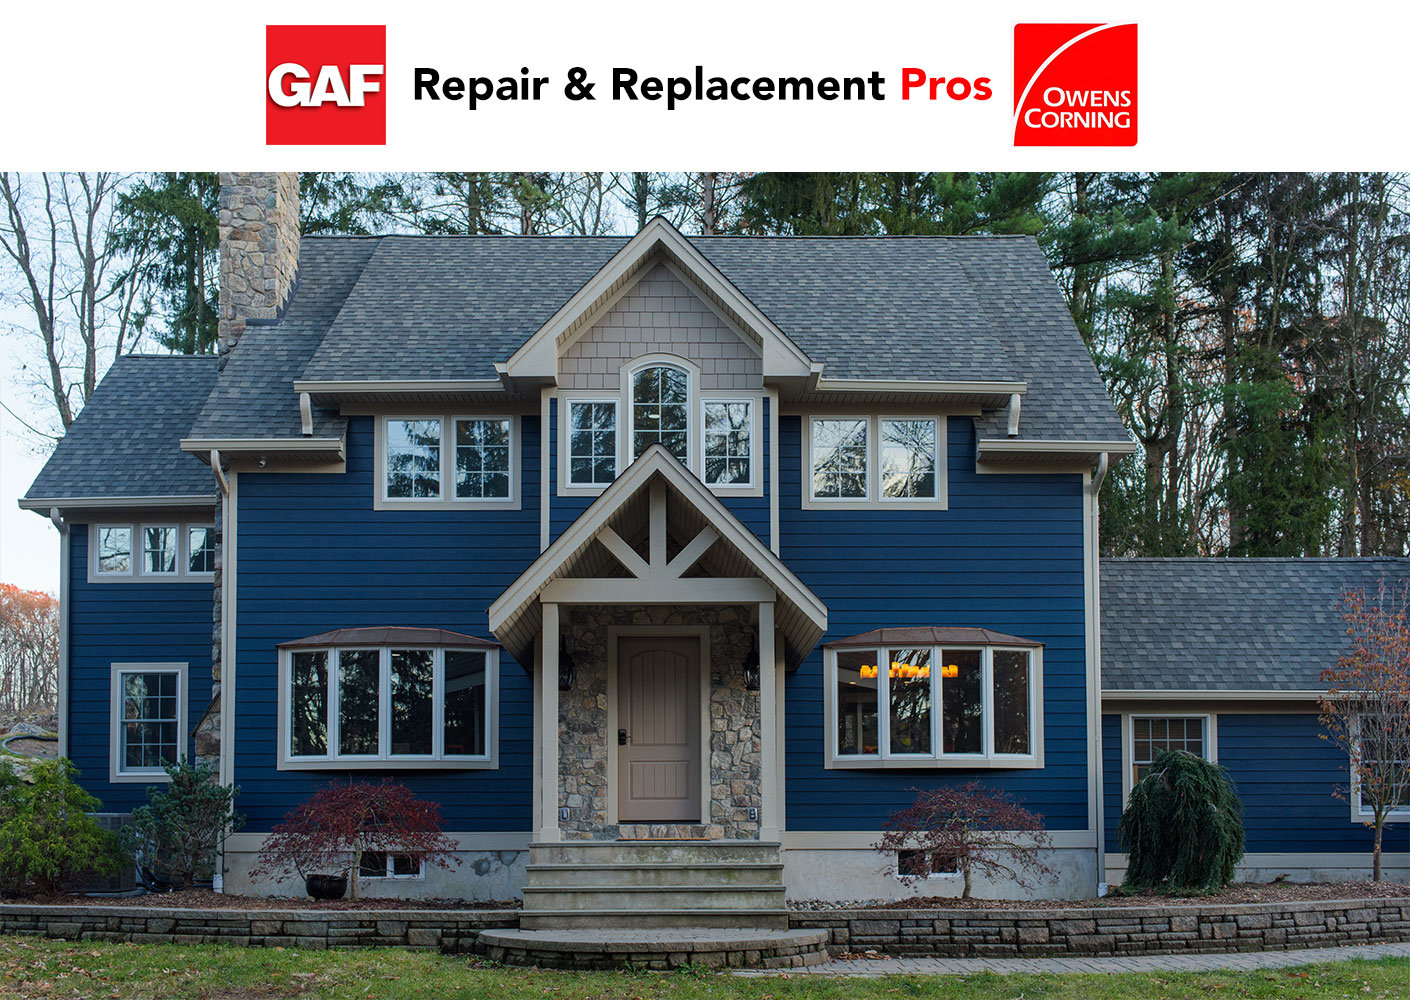 Roof-Repair-Replacement-Pros-GAF-OwensCorningShingles-NJ